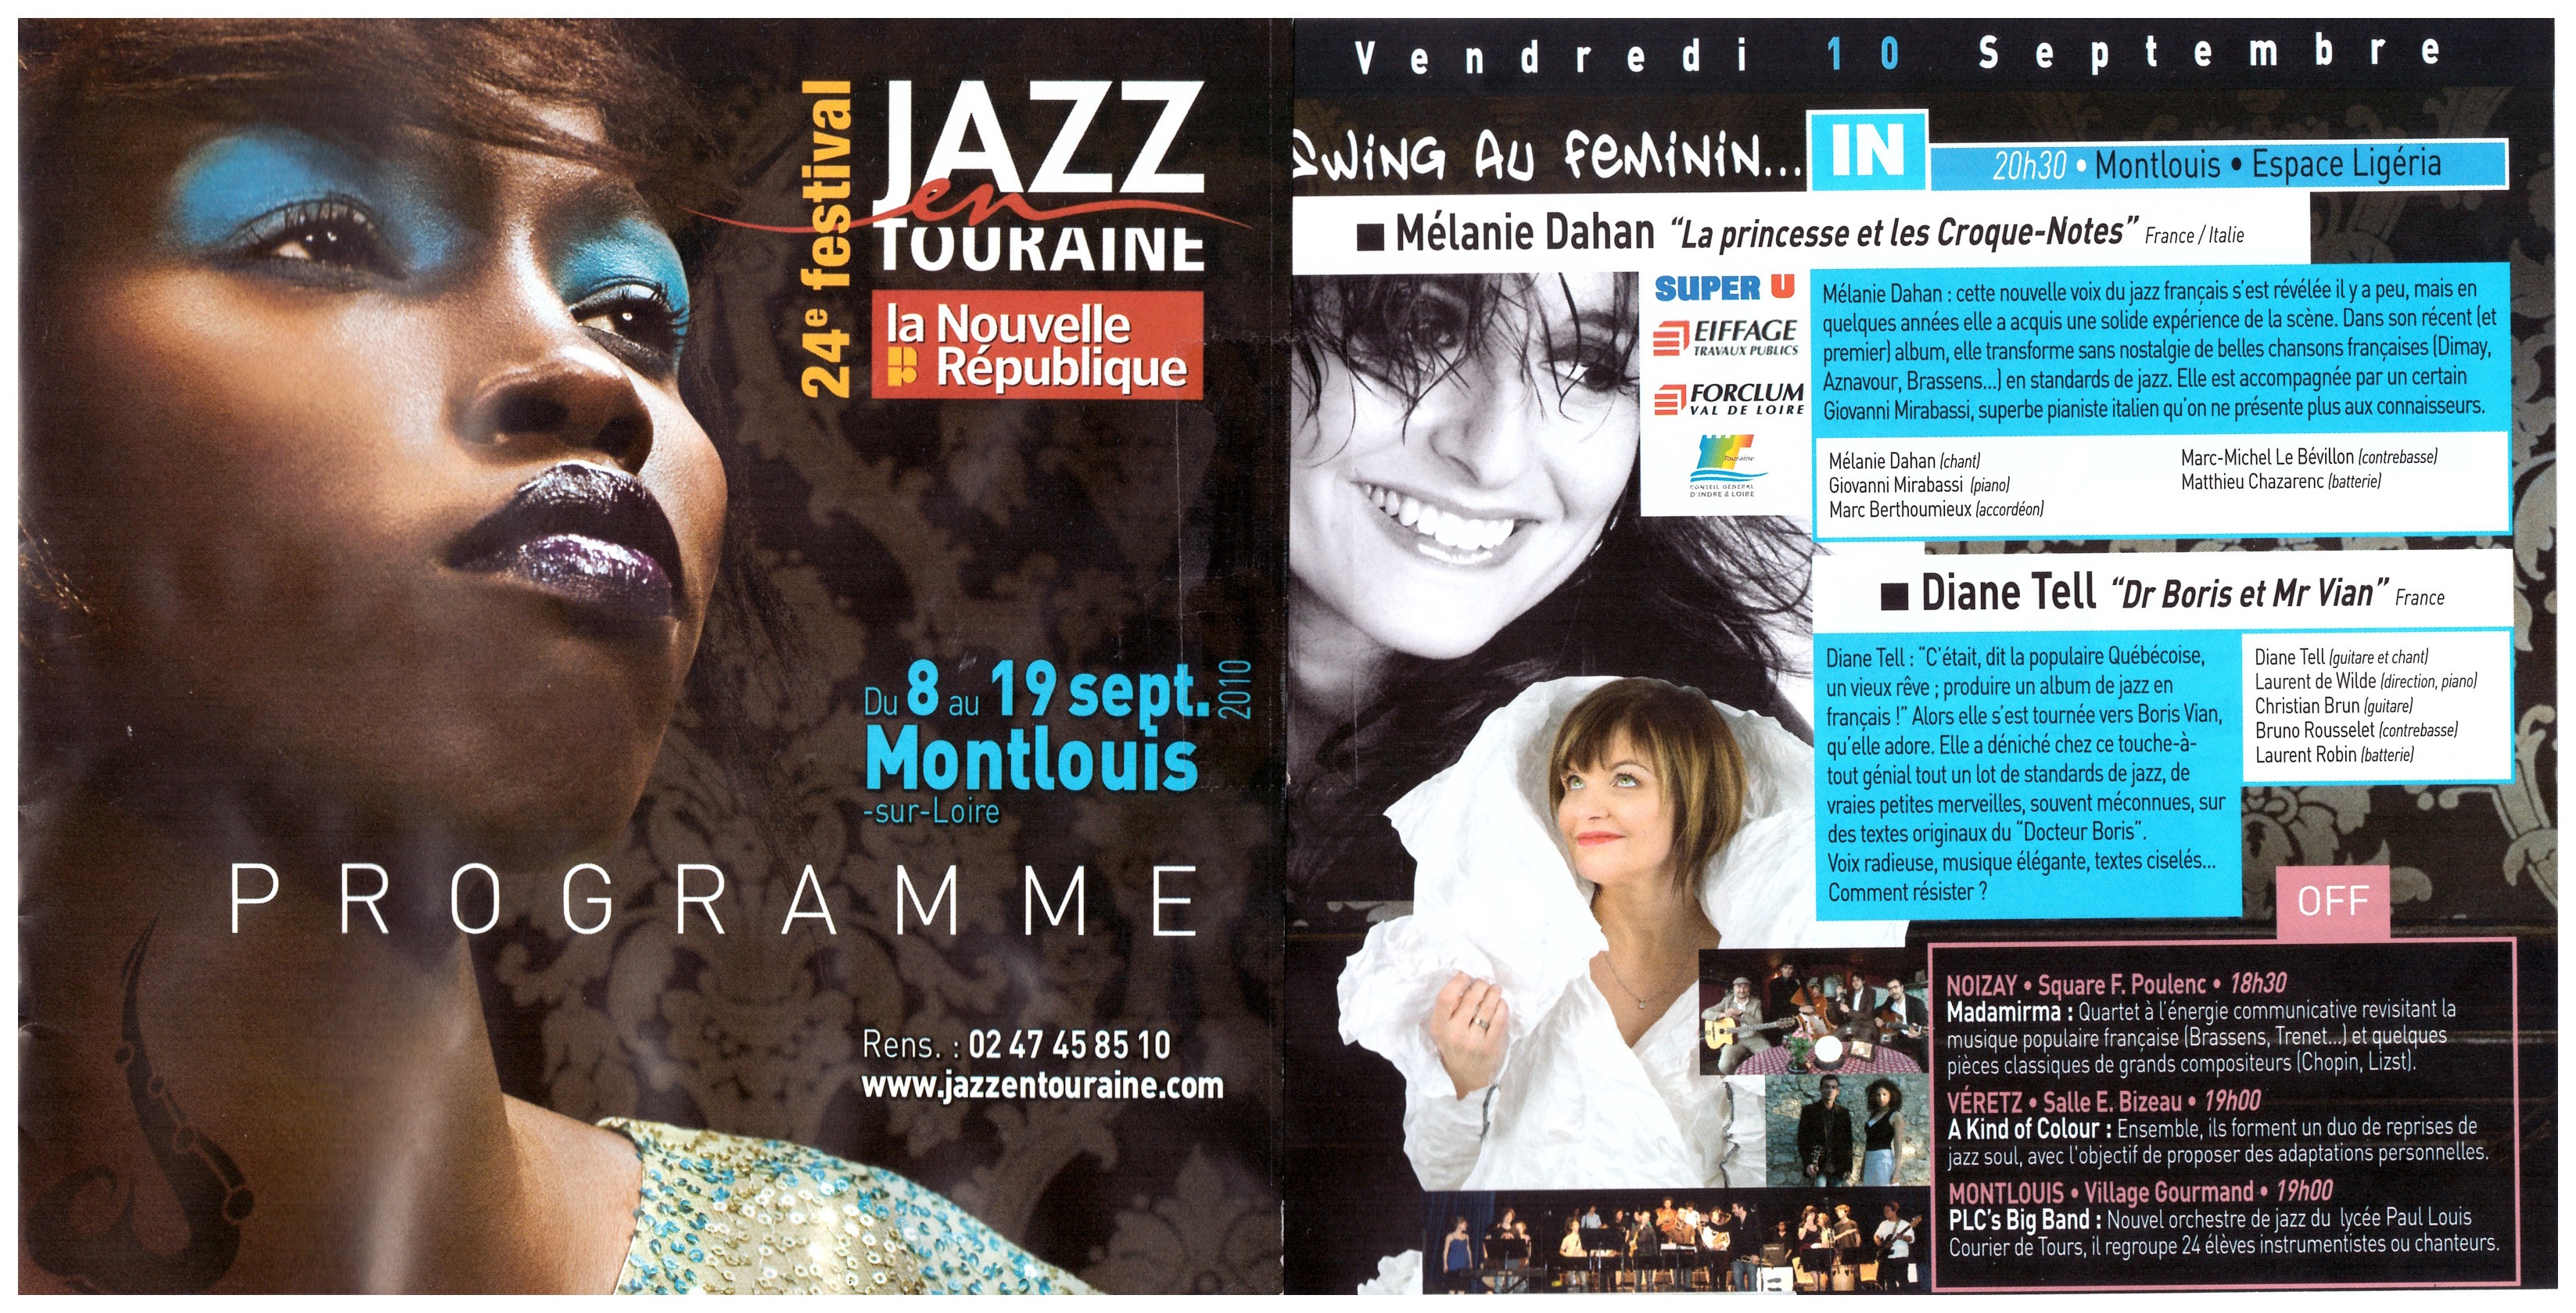 Festival Jazz en touraine